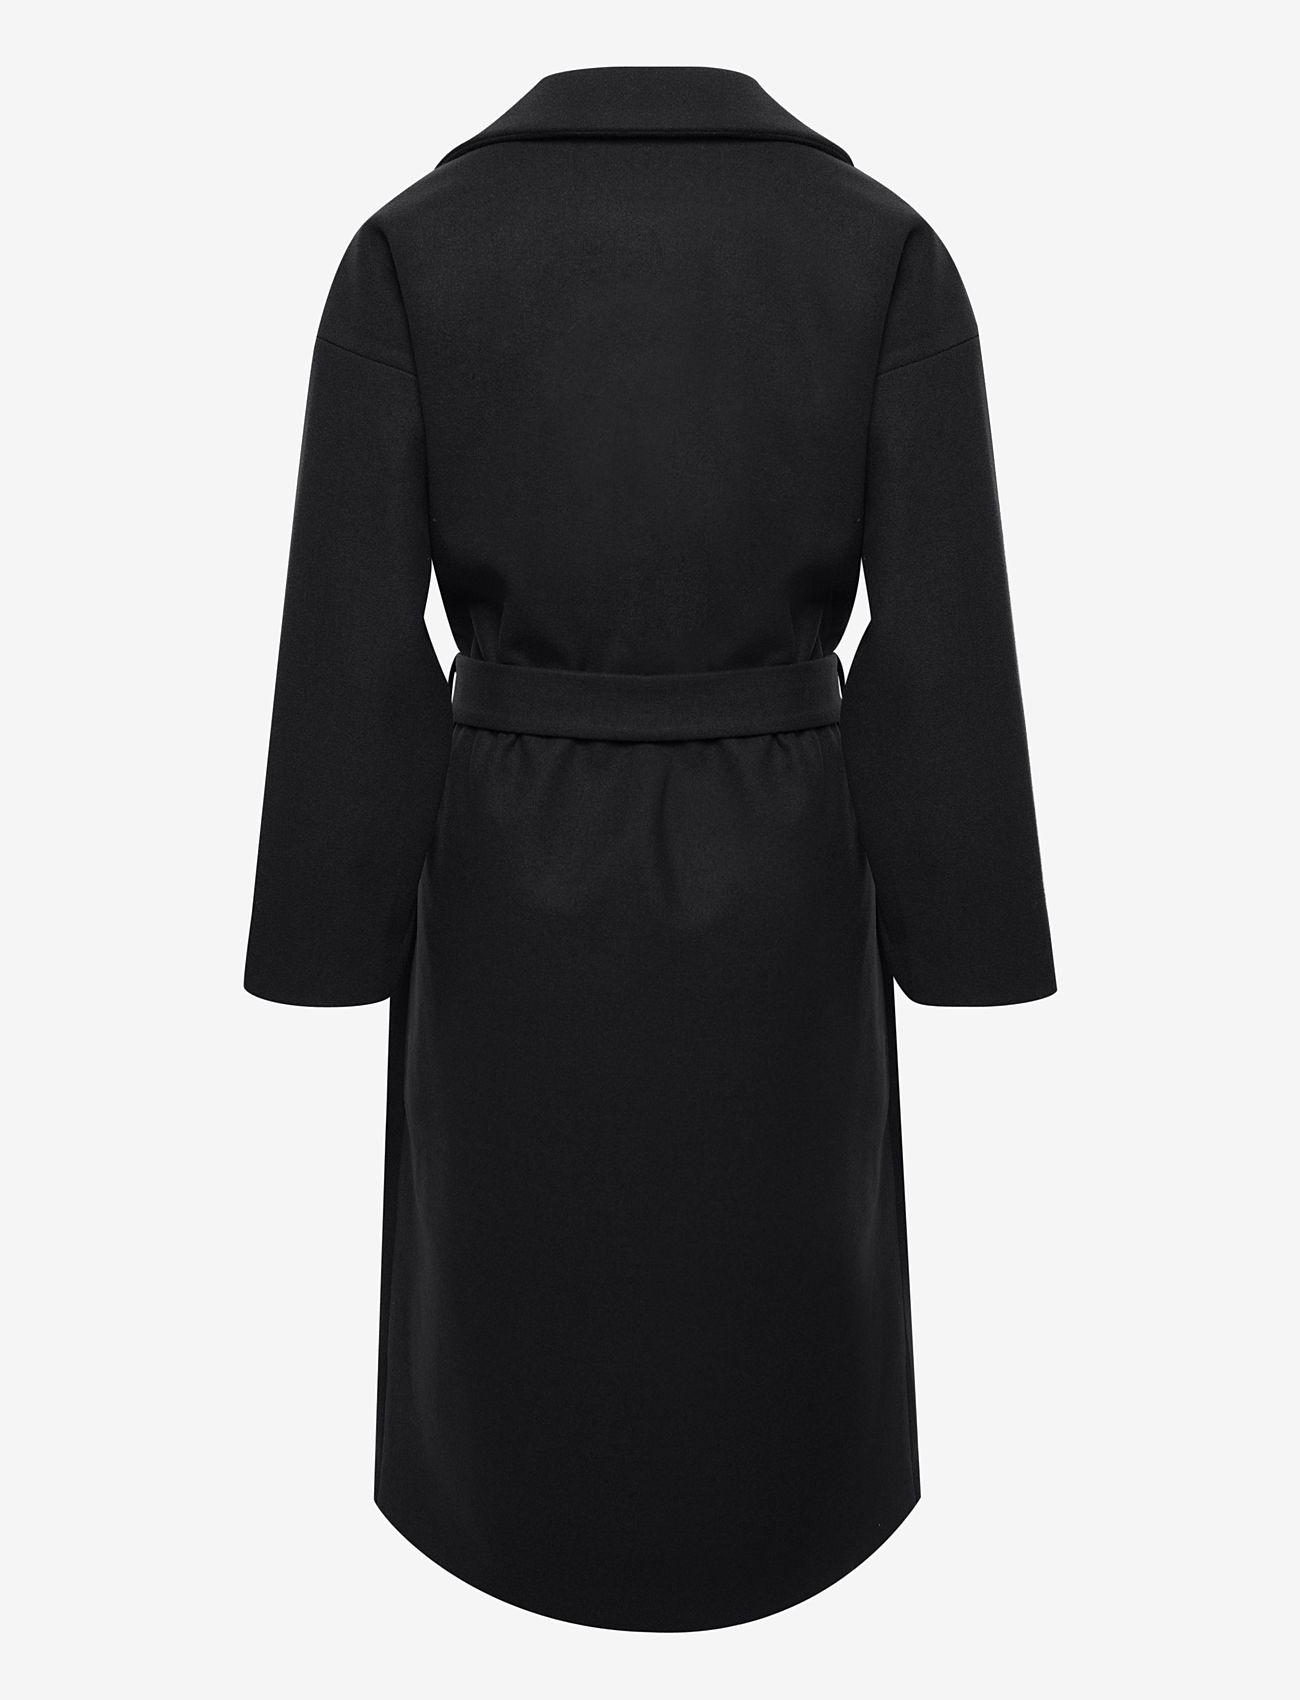 ICHI - IHJANNET JA2 - wool coats - black - 1